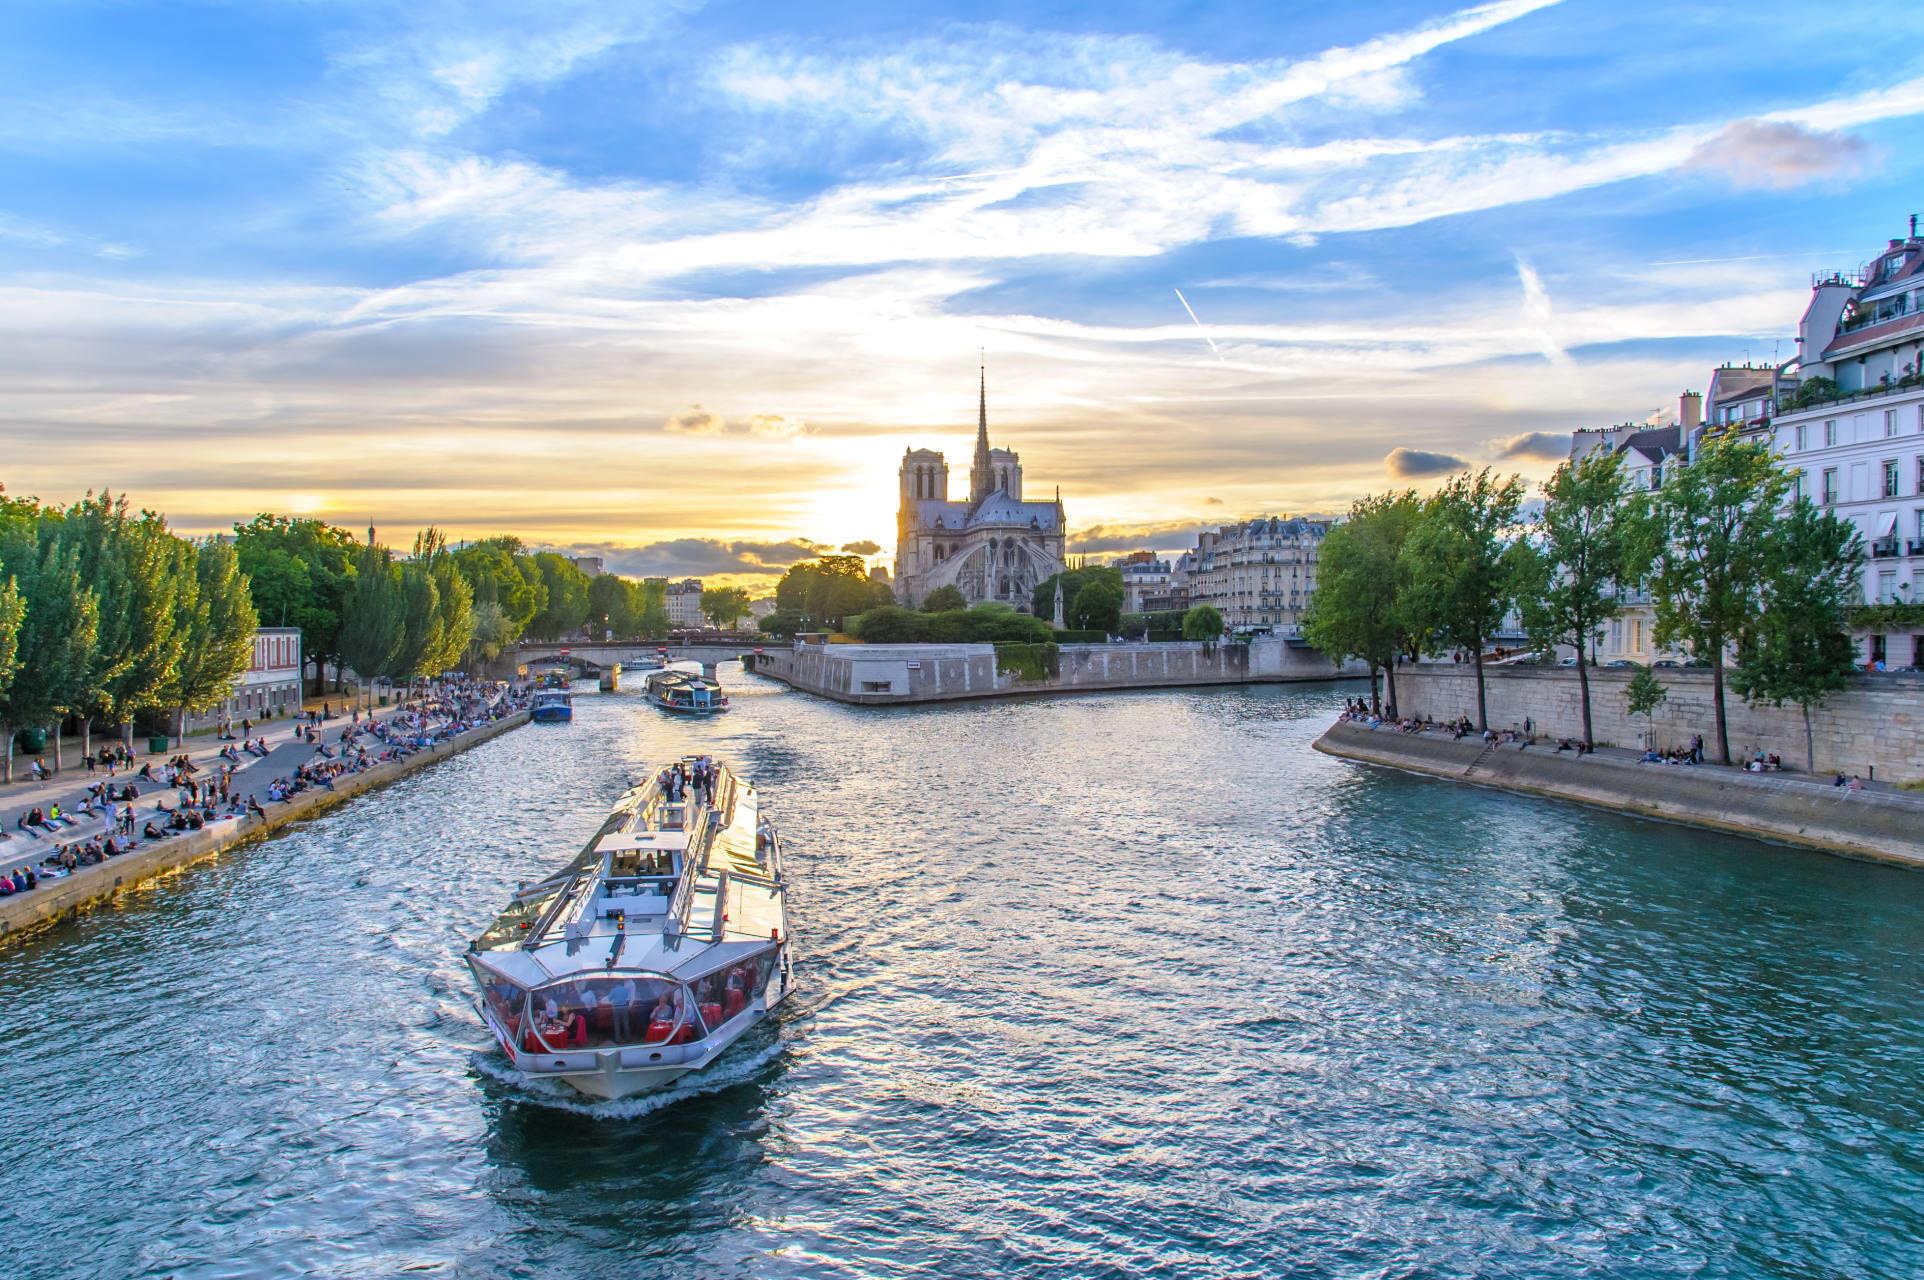 Paris - Cruise on the Seine river